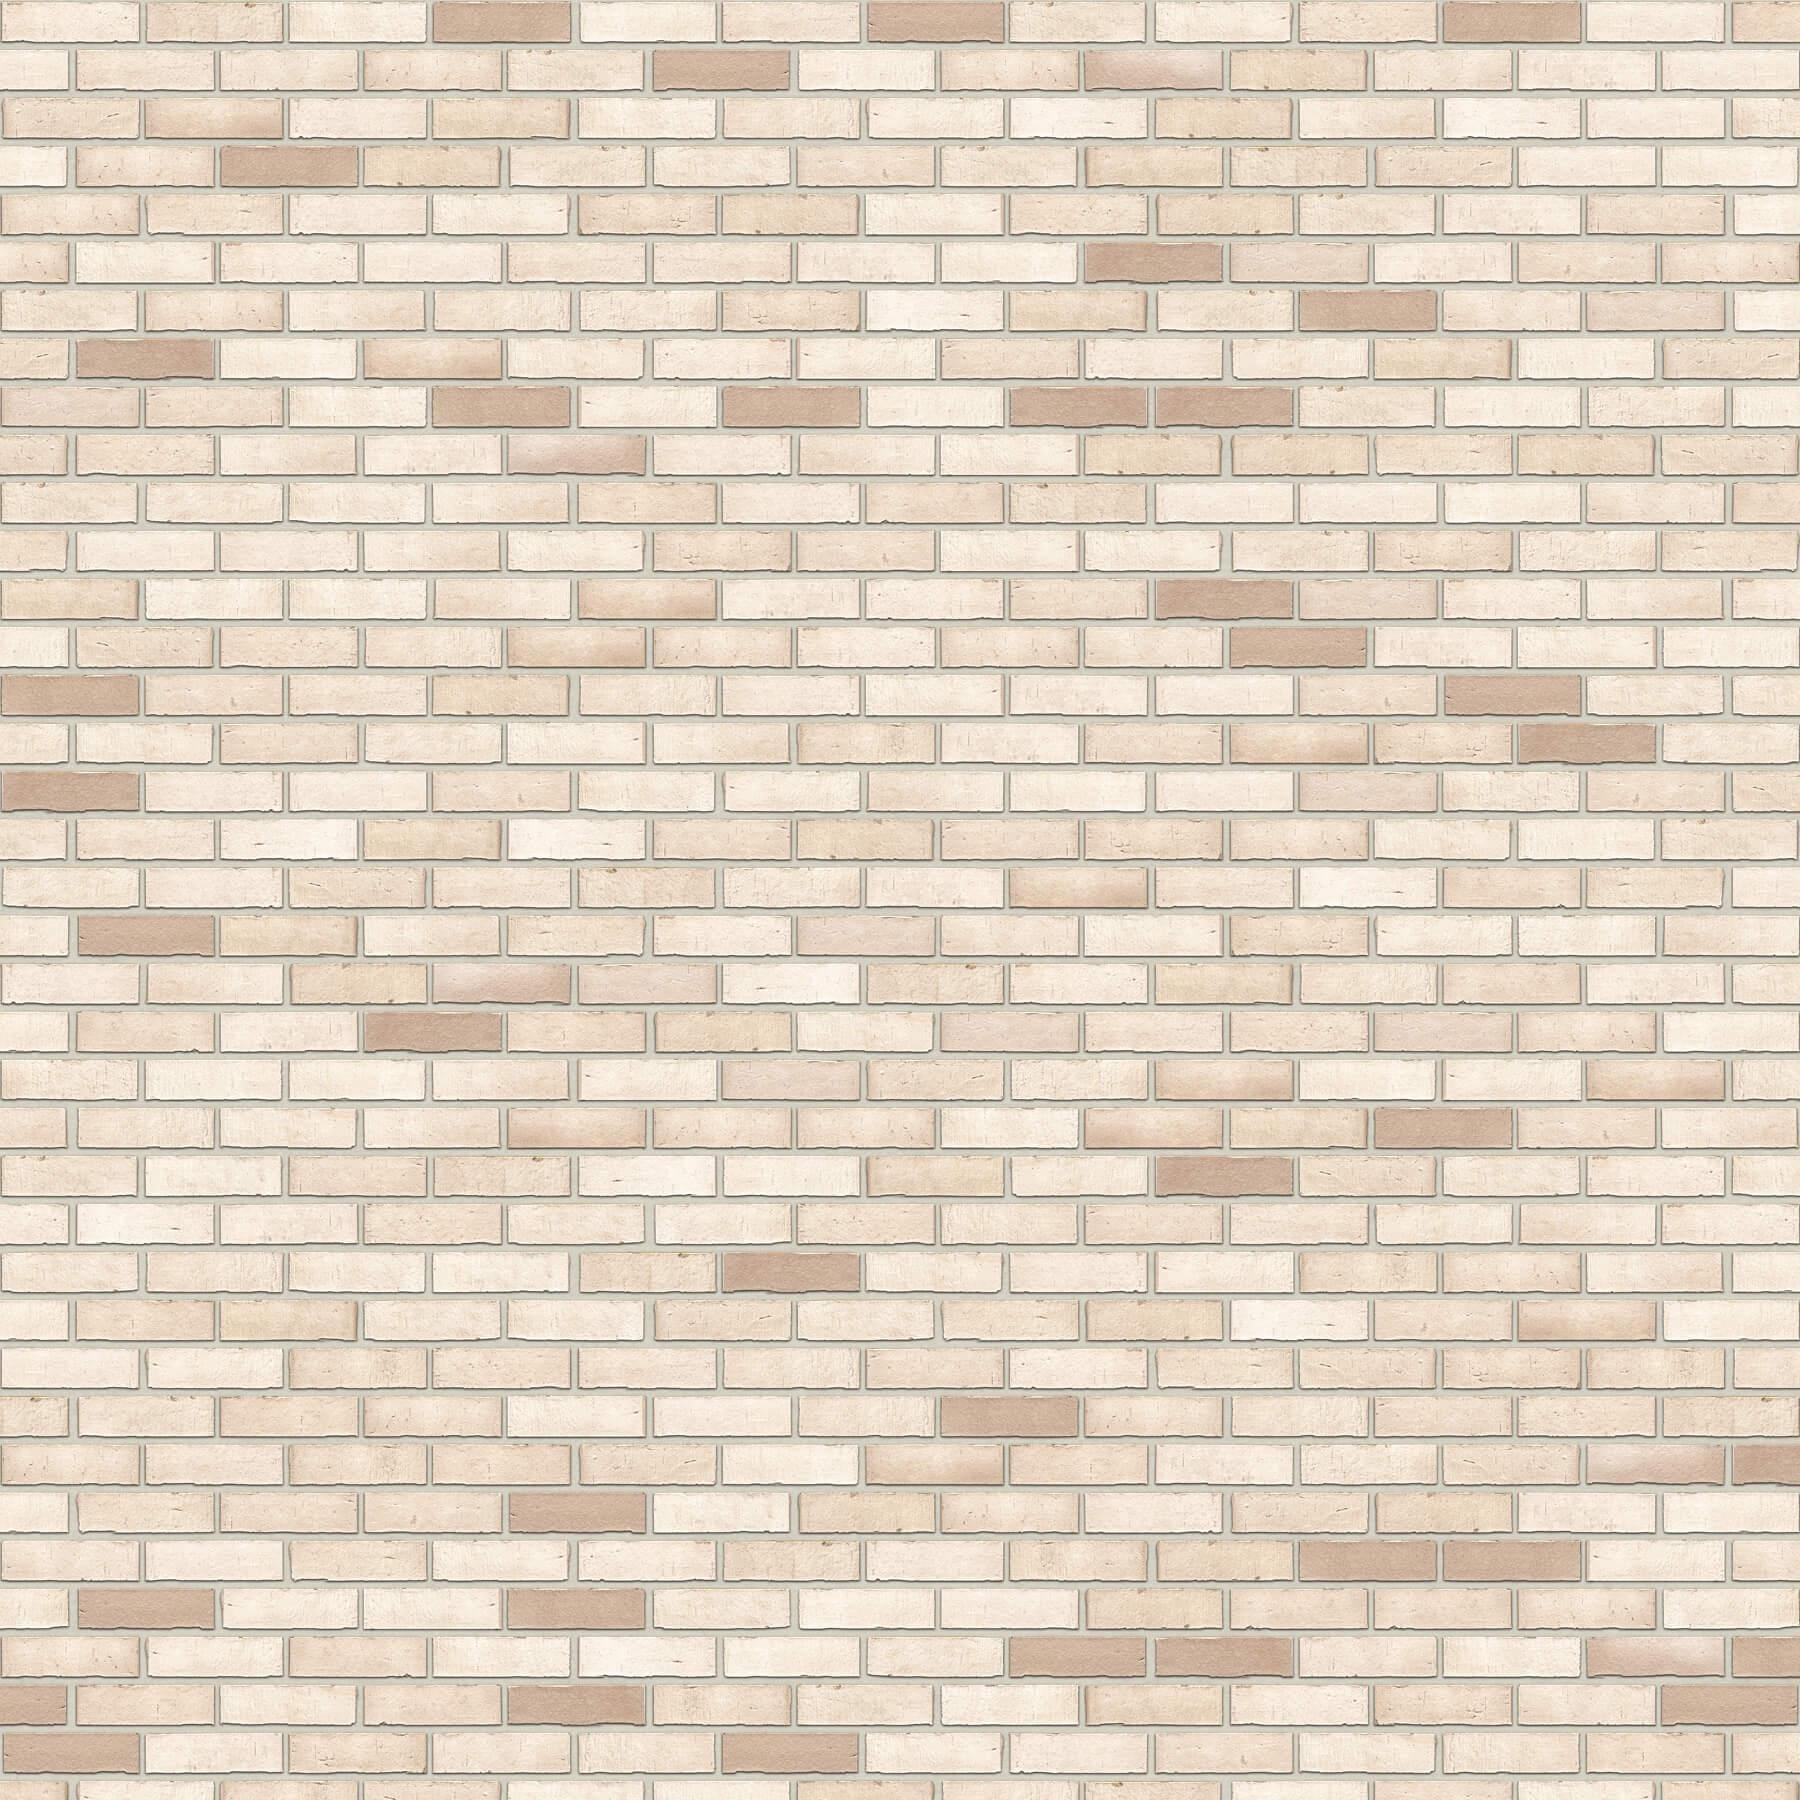 Puna-cigla-FeldHaus-Klinker-brick-house-beograd-nf-k-941-Bela Fuga